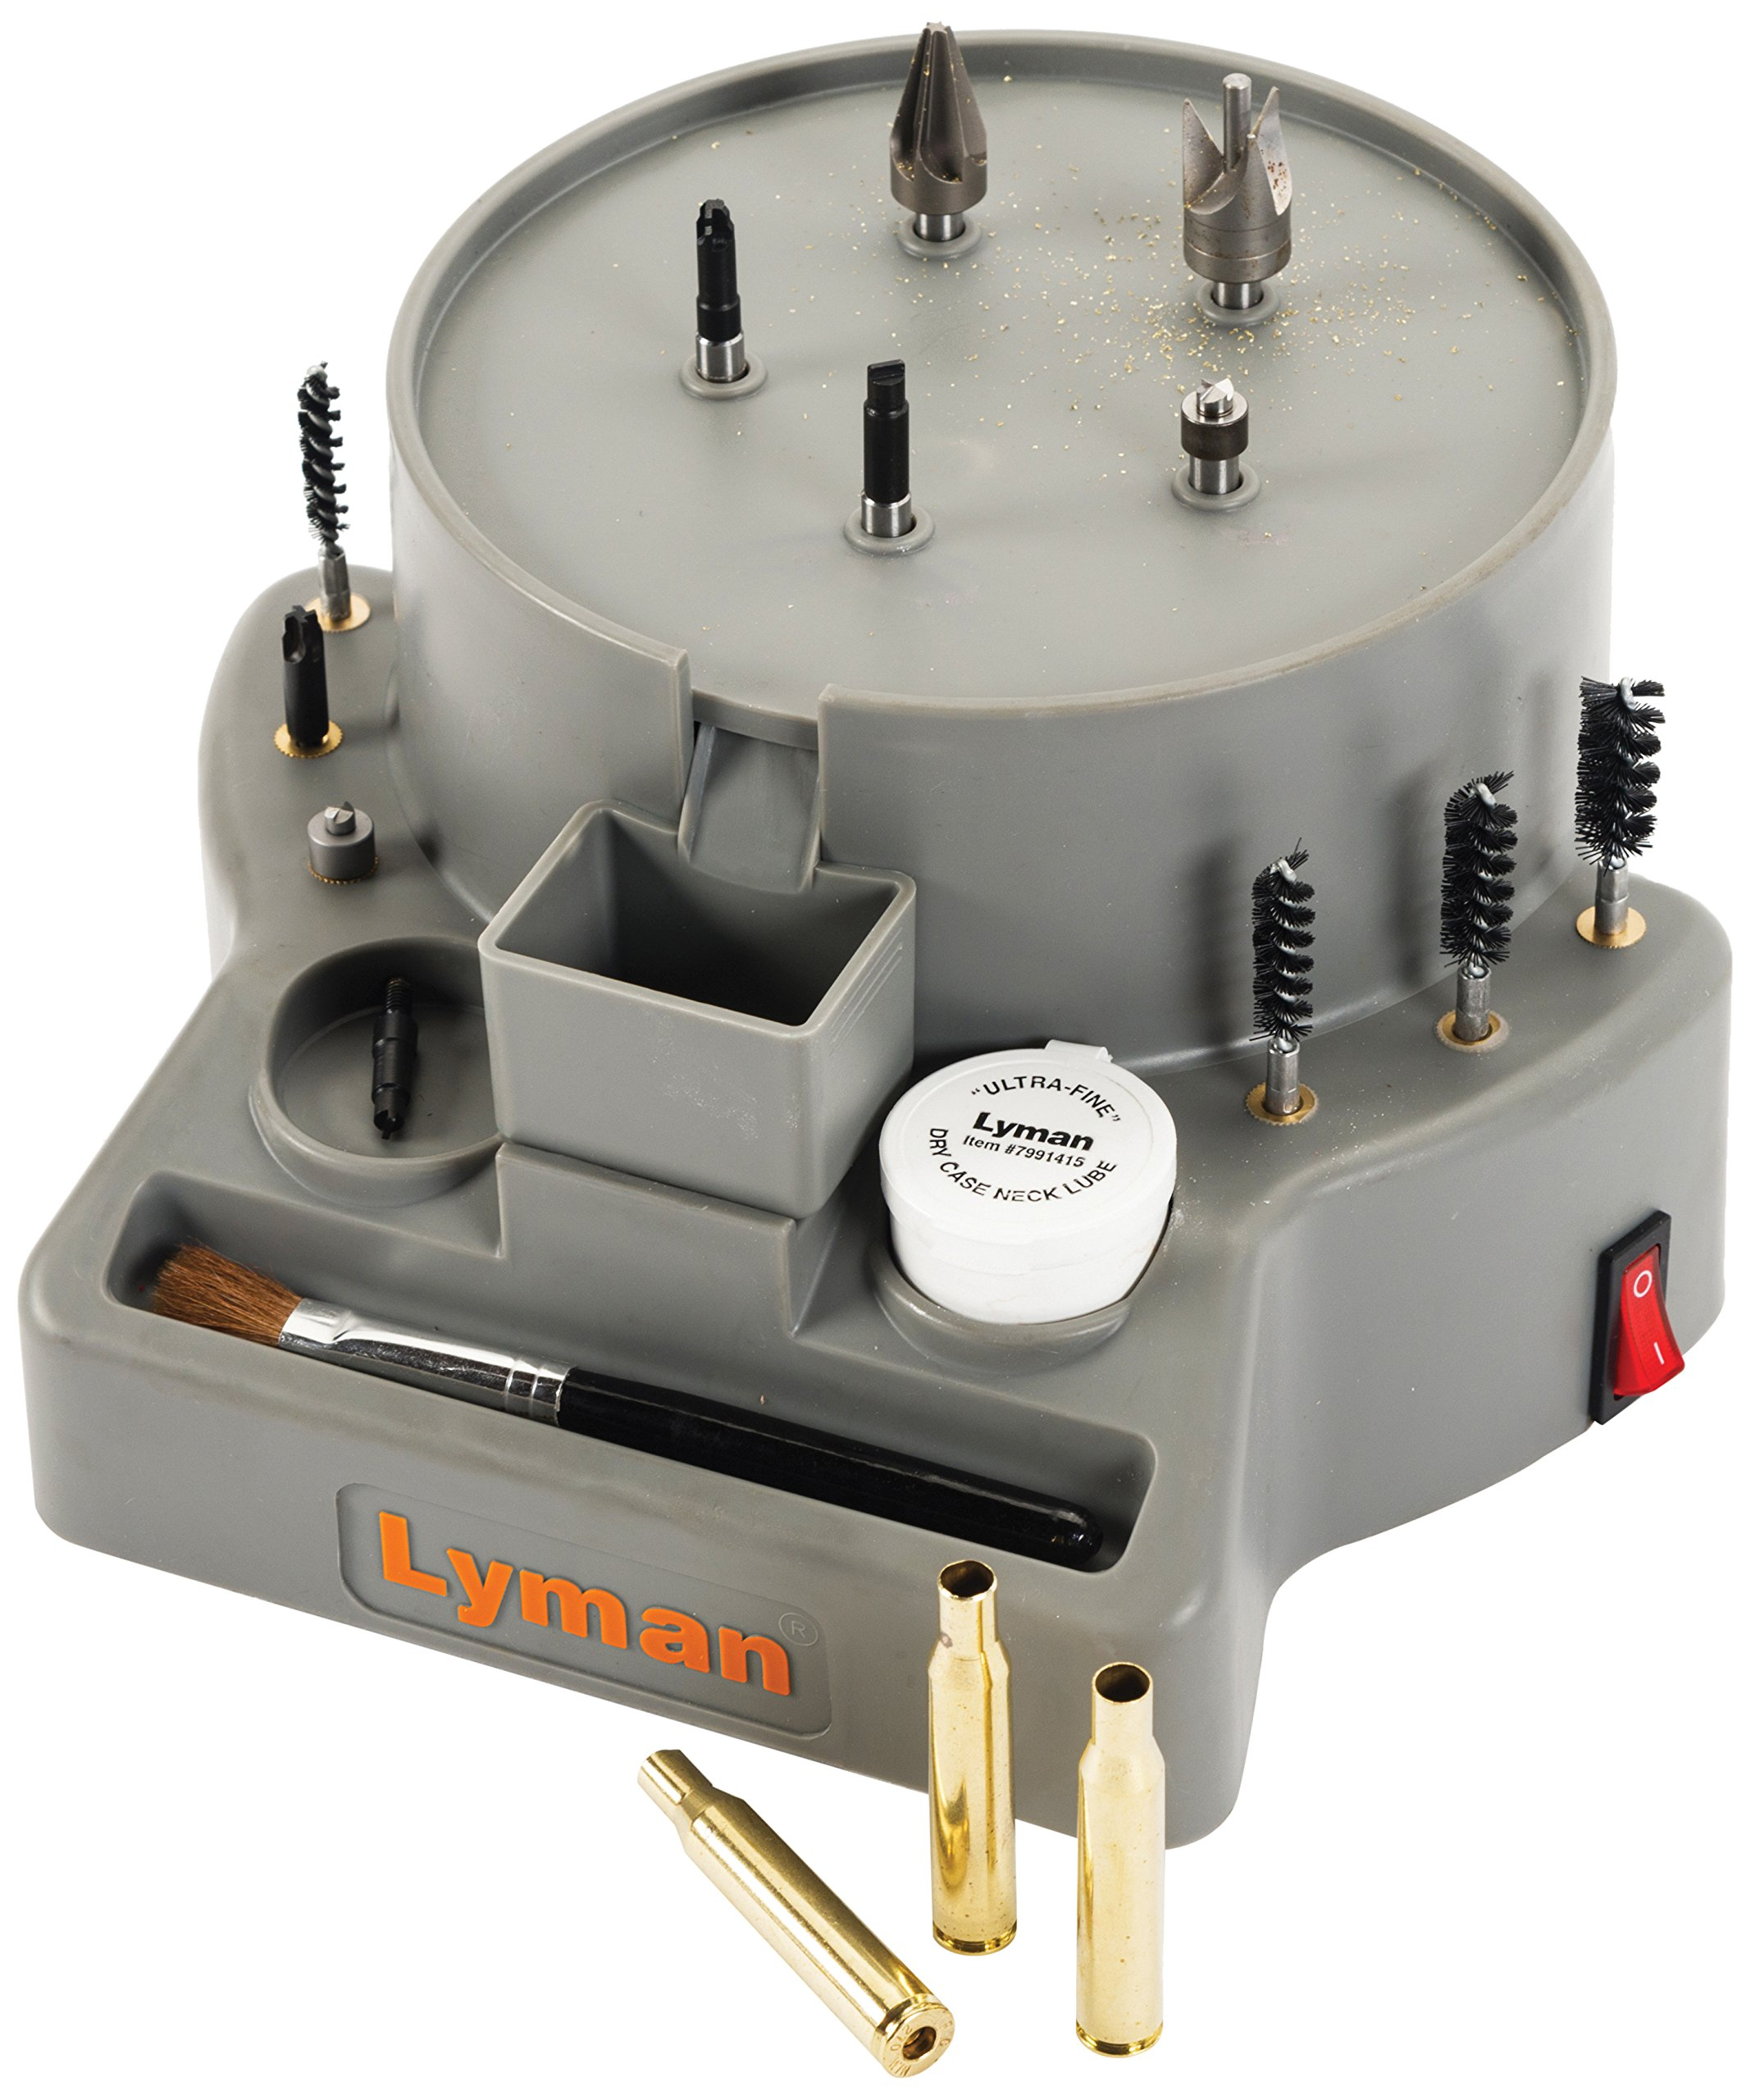 Lyman Case Prep Xpress 115V 7810220 by Lyman